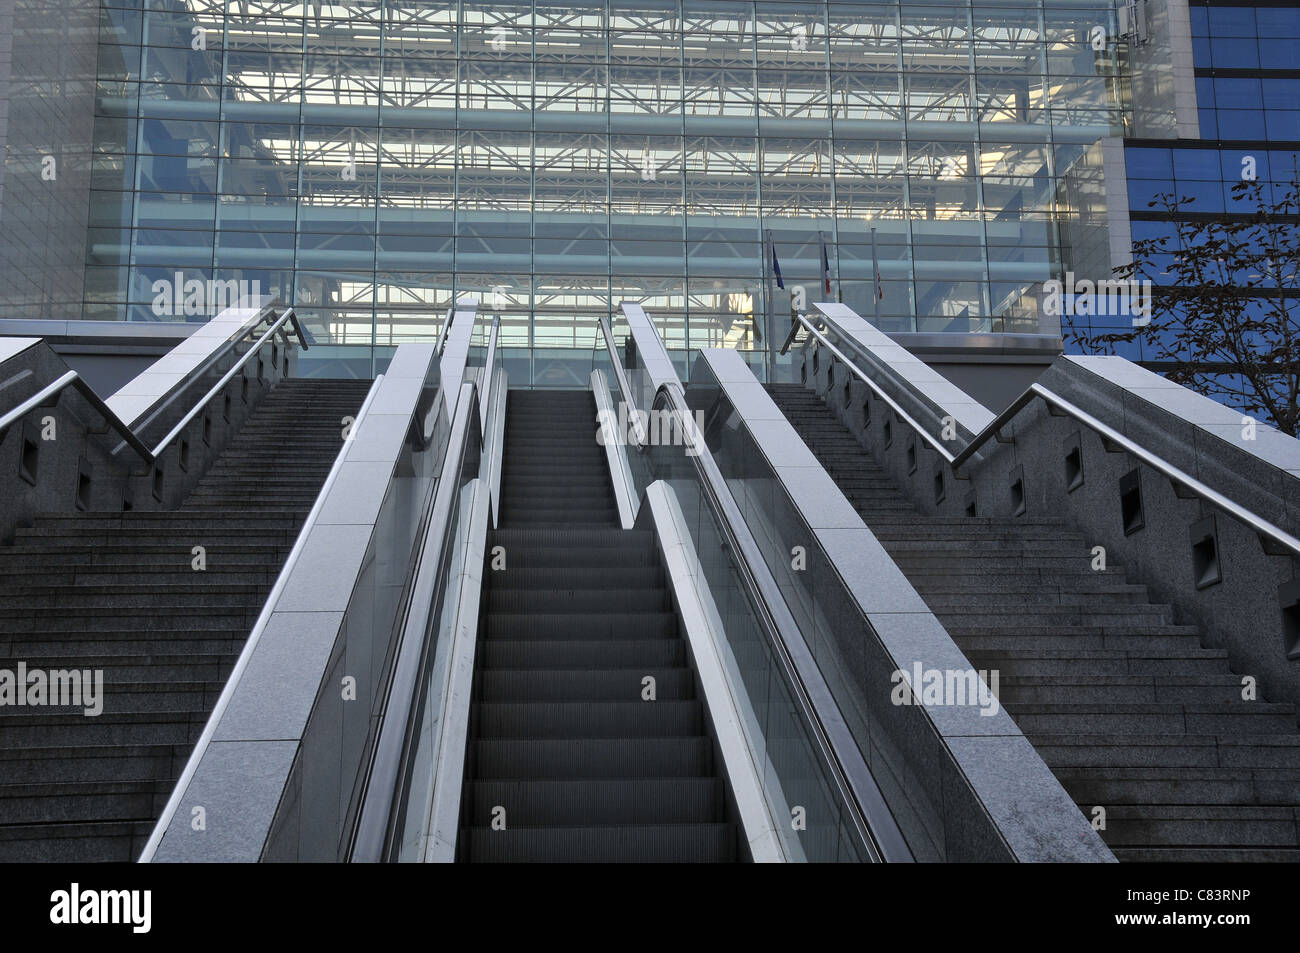 escalator Bercy Paris France - Stock Image